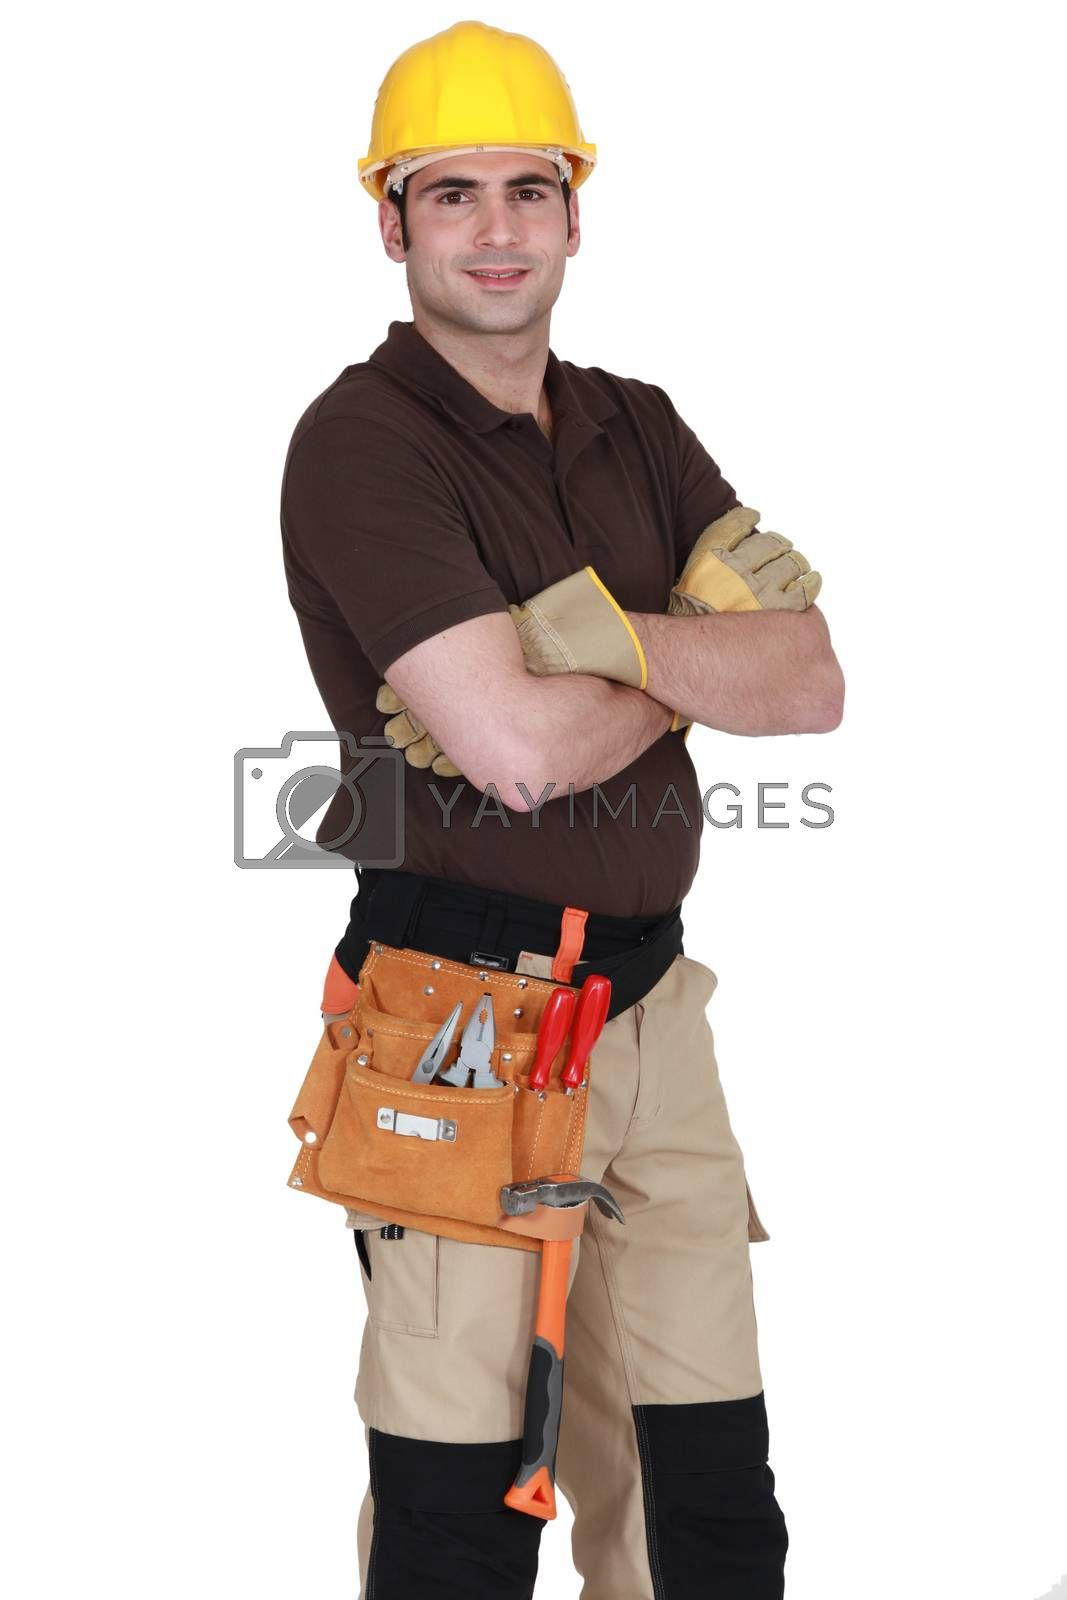 An handyman posing